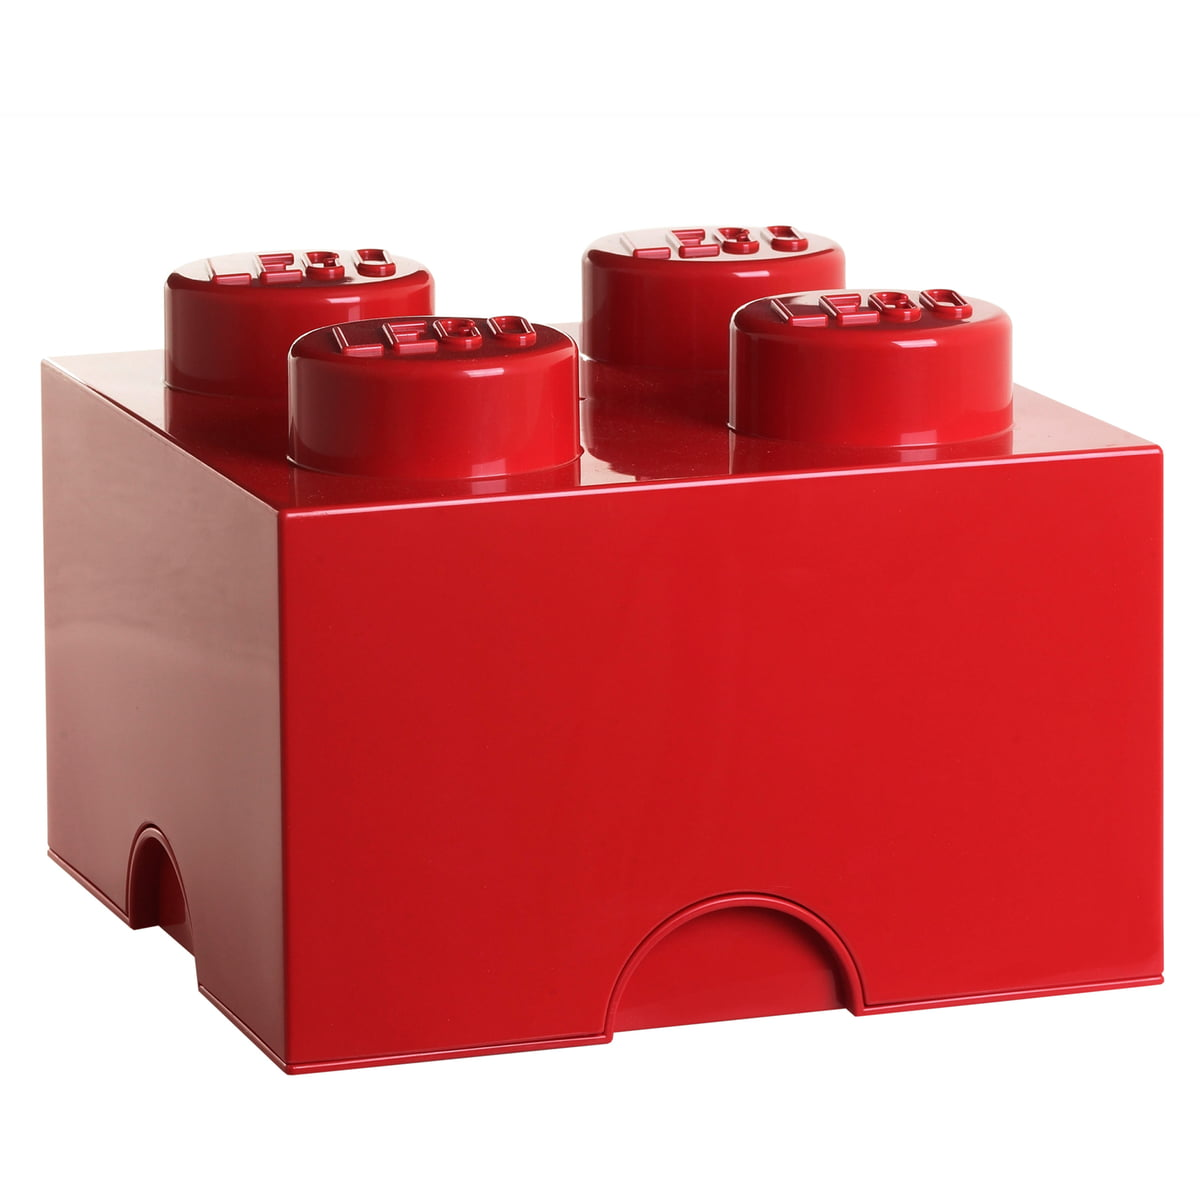 Lego - Storage Brick 4, rot   Kinderzimmer   Rot   Lego